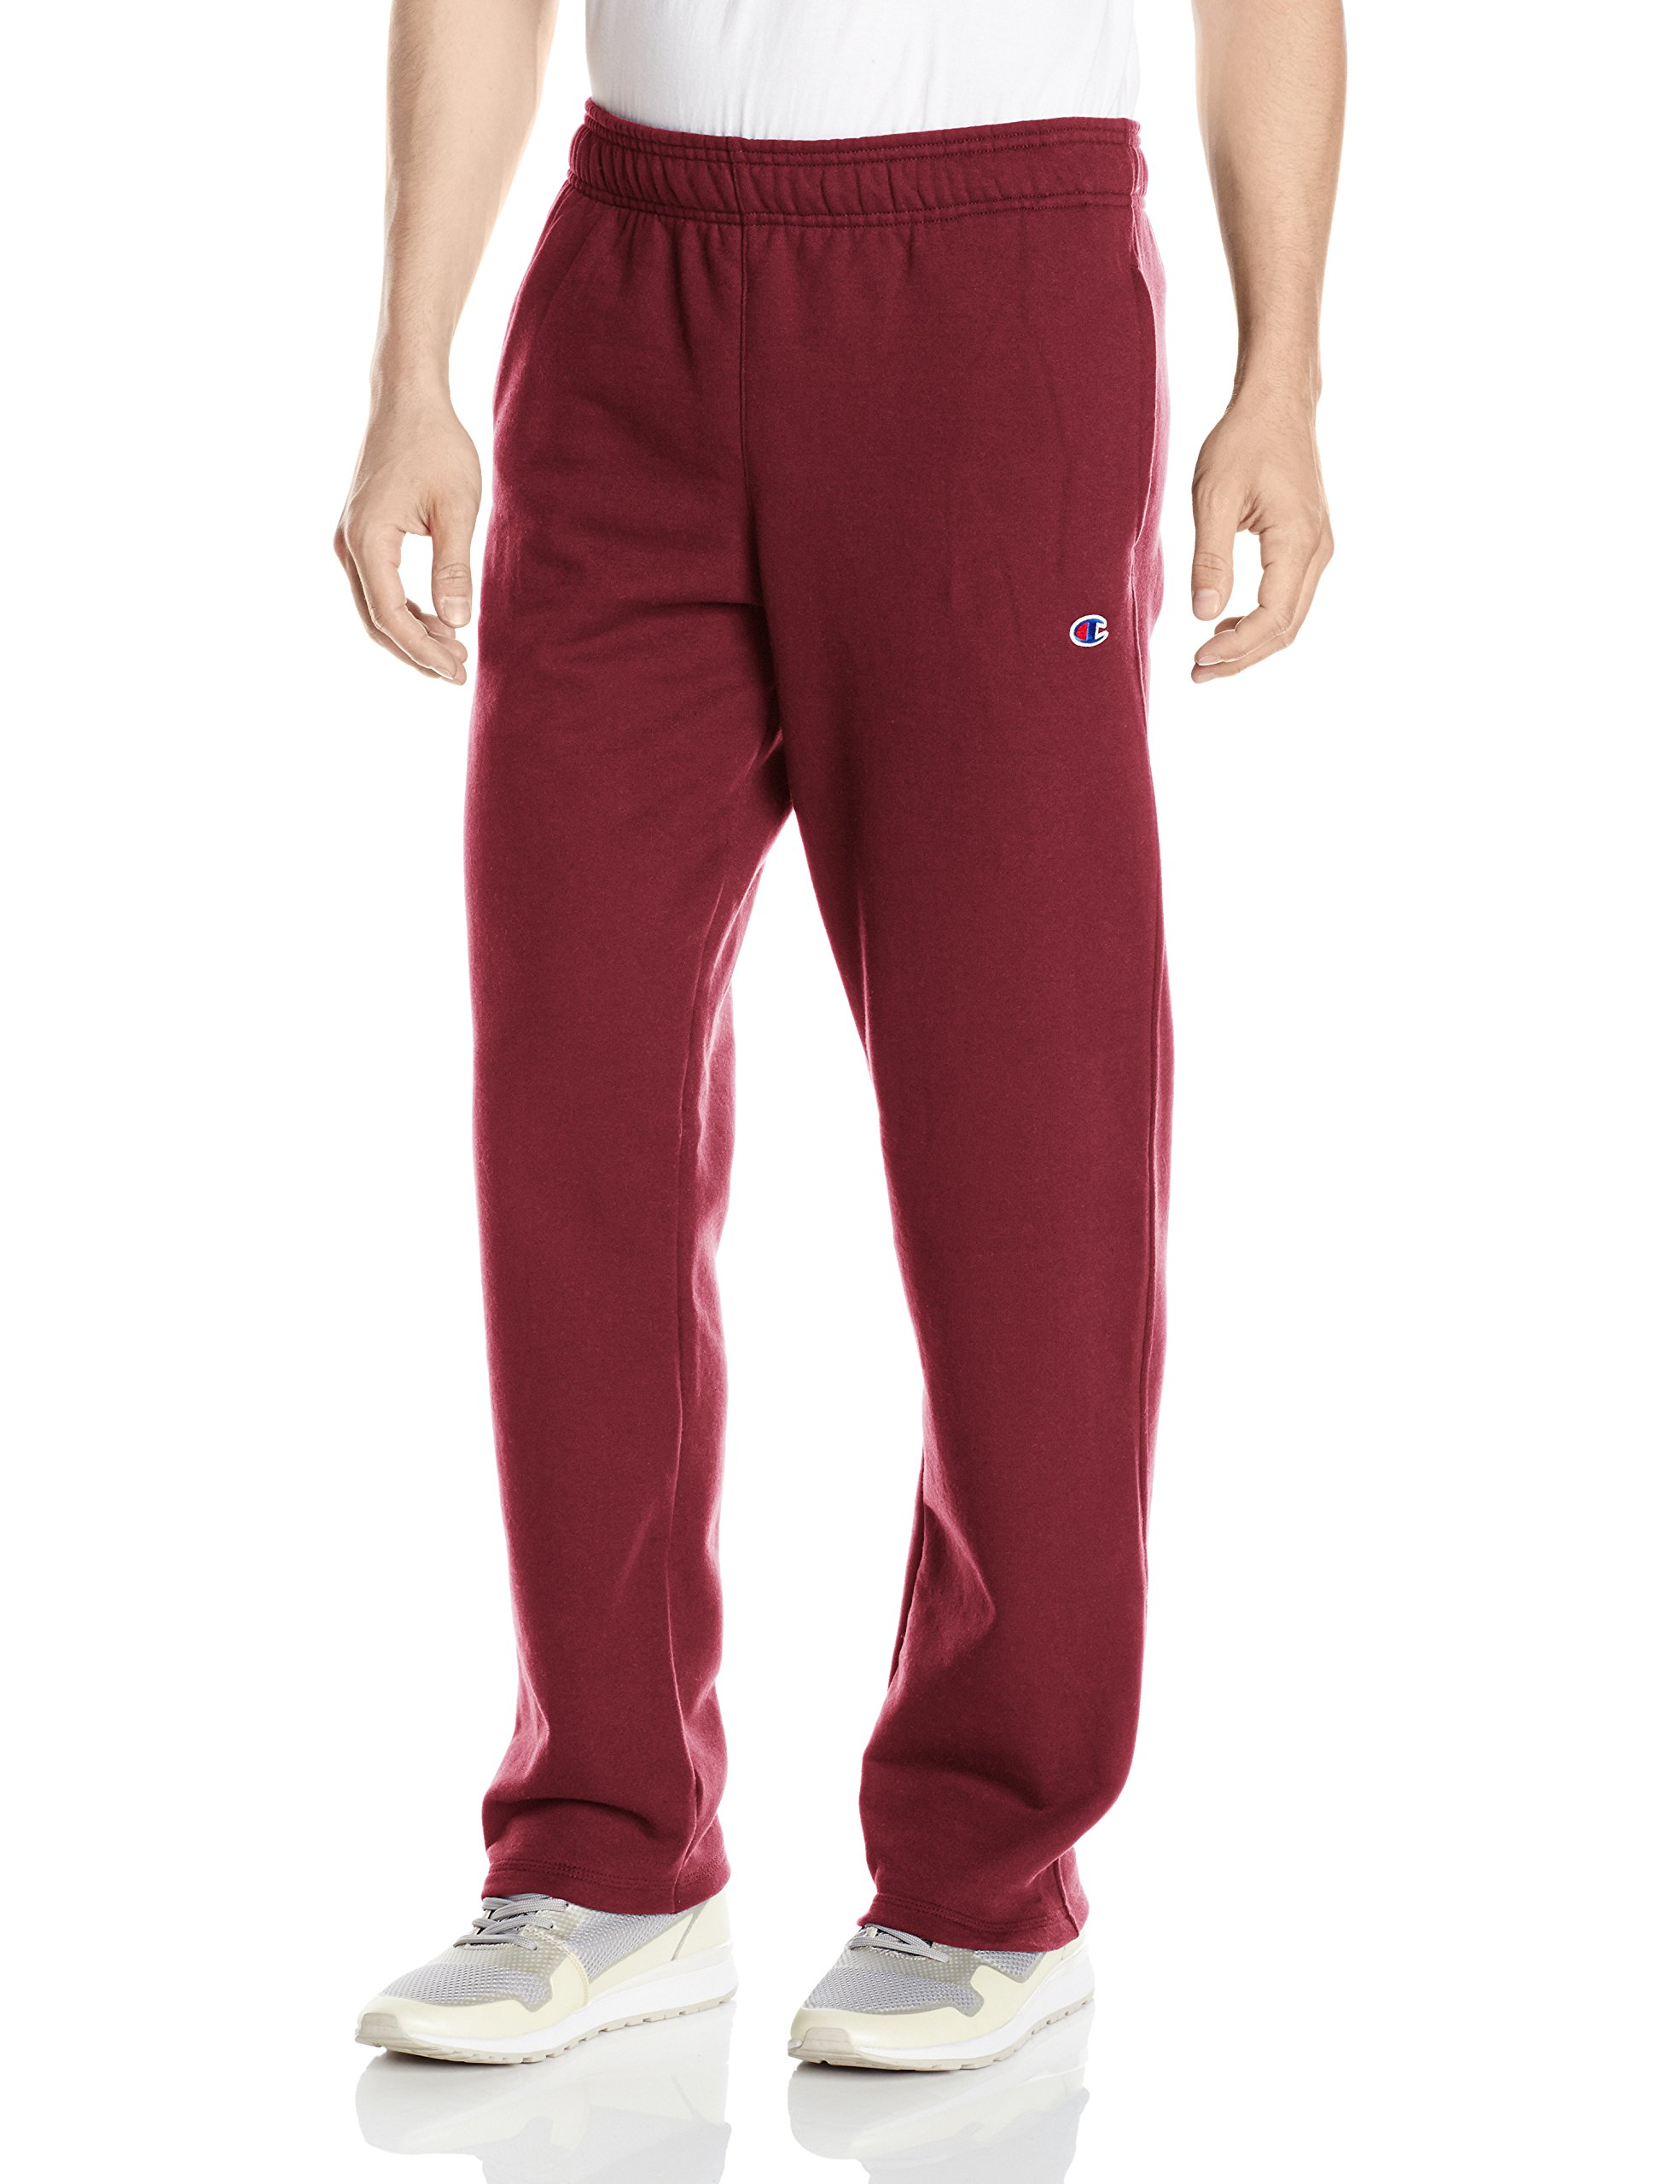 Champion Men's Powerblend Open Bottom Fleece Pant, Maroon, Large